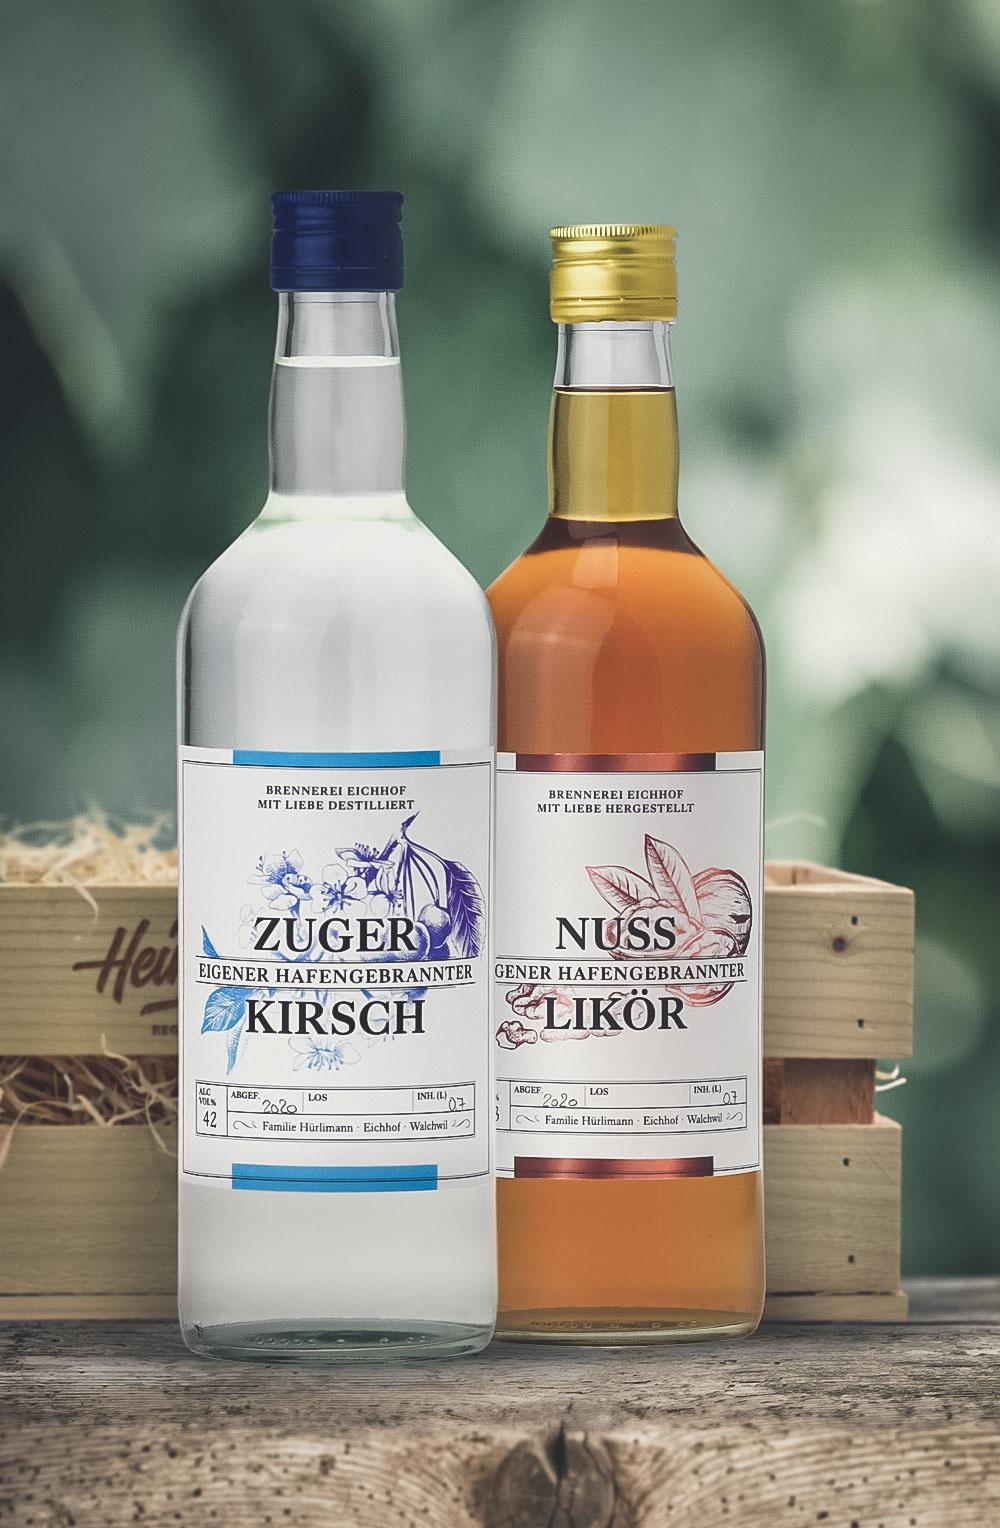 Zuger Kirsch & Nuss Likör 70cl in Geschenkharasse - Copy-1